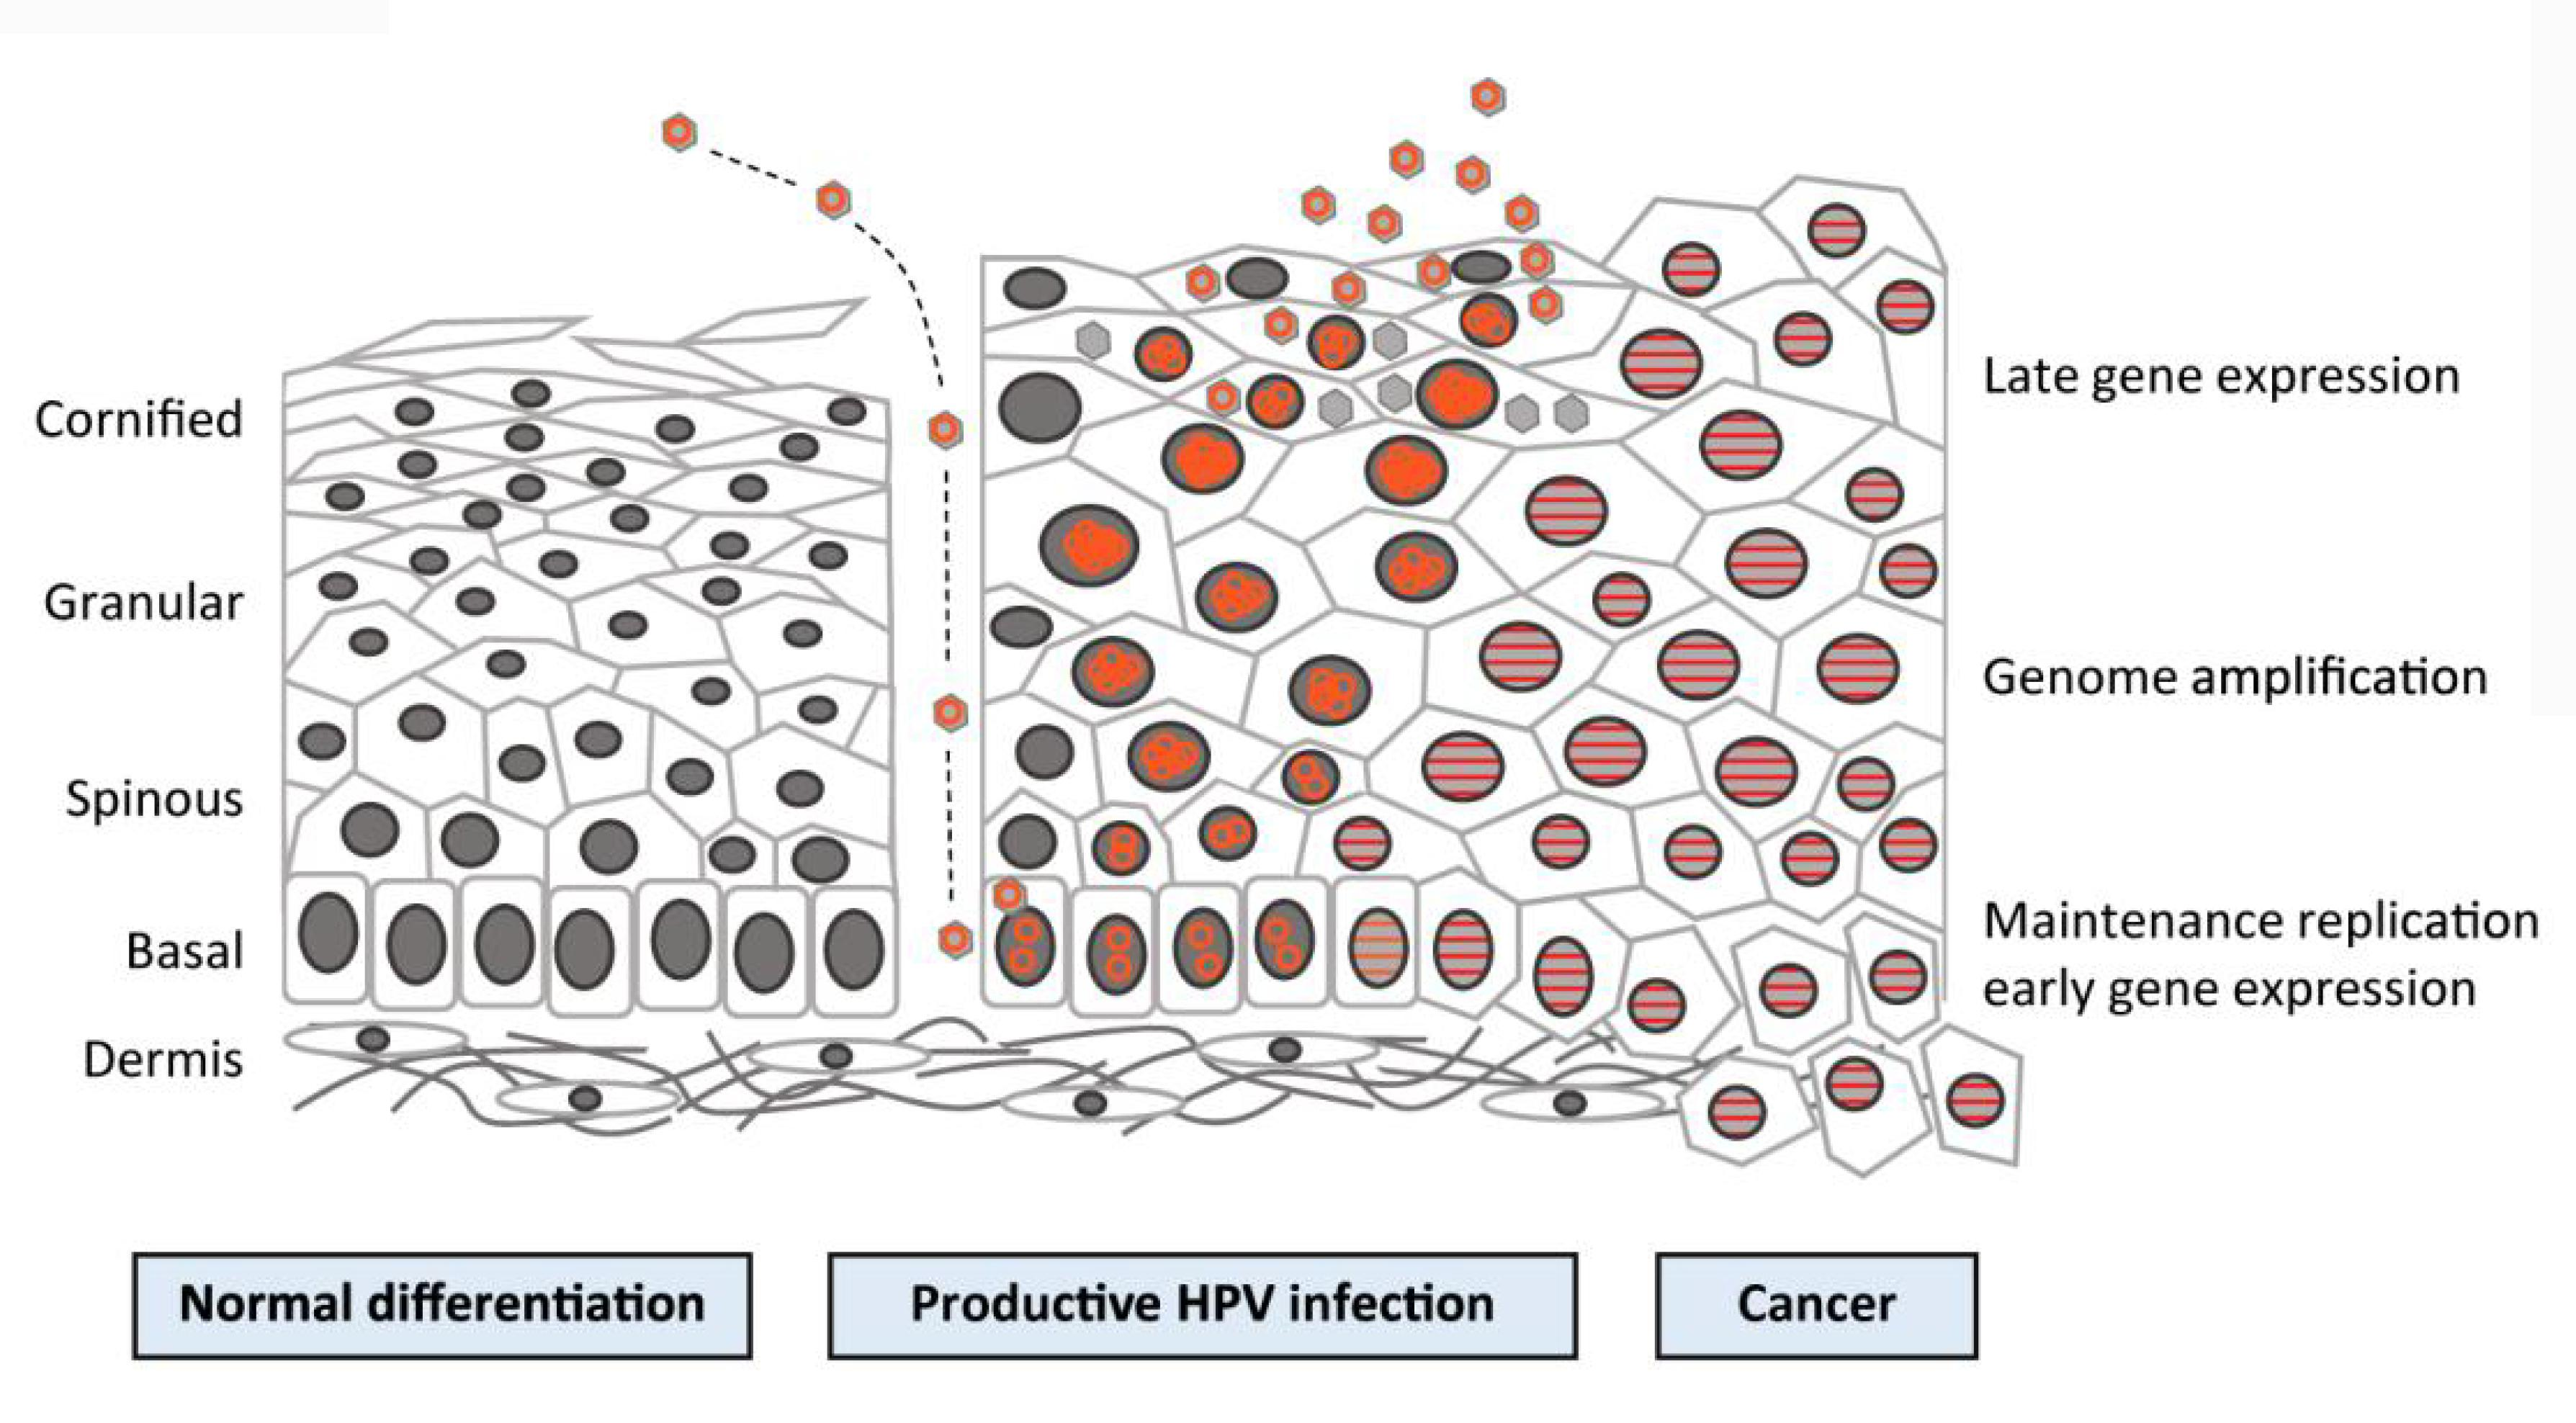 sarcoma cancer information